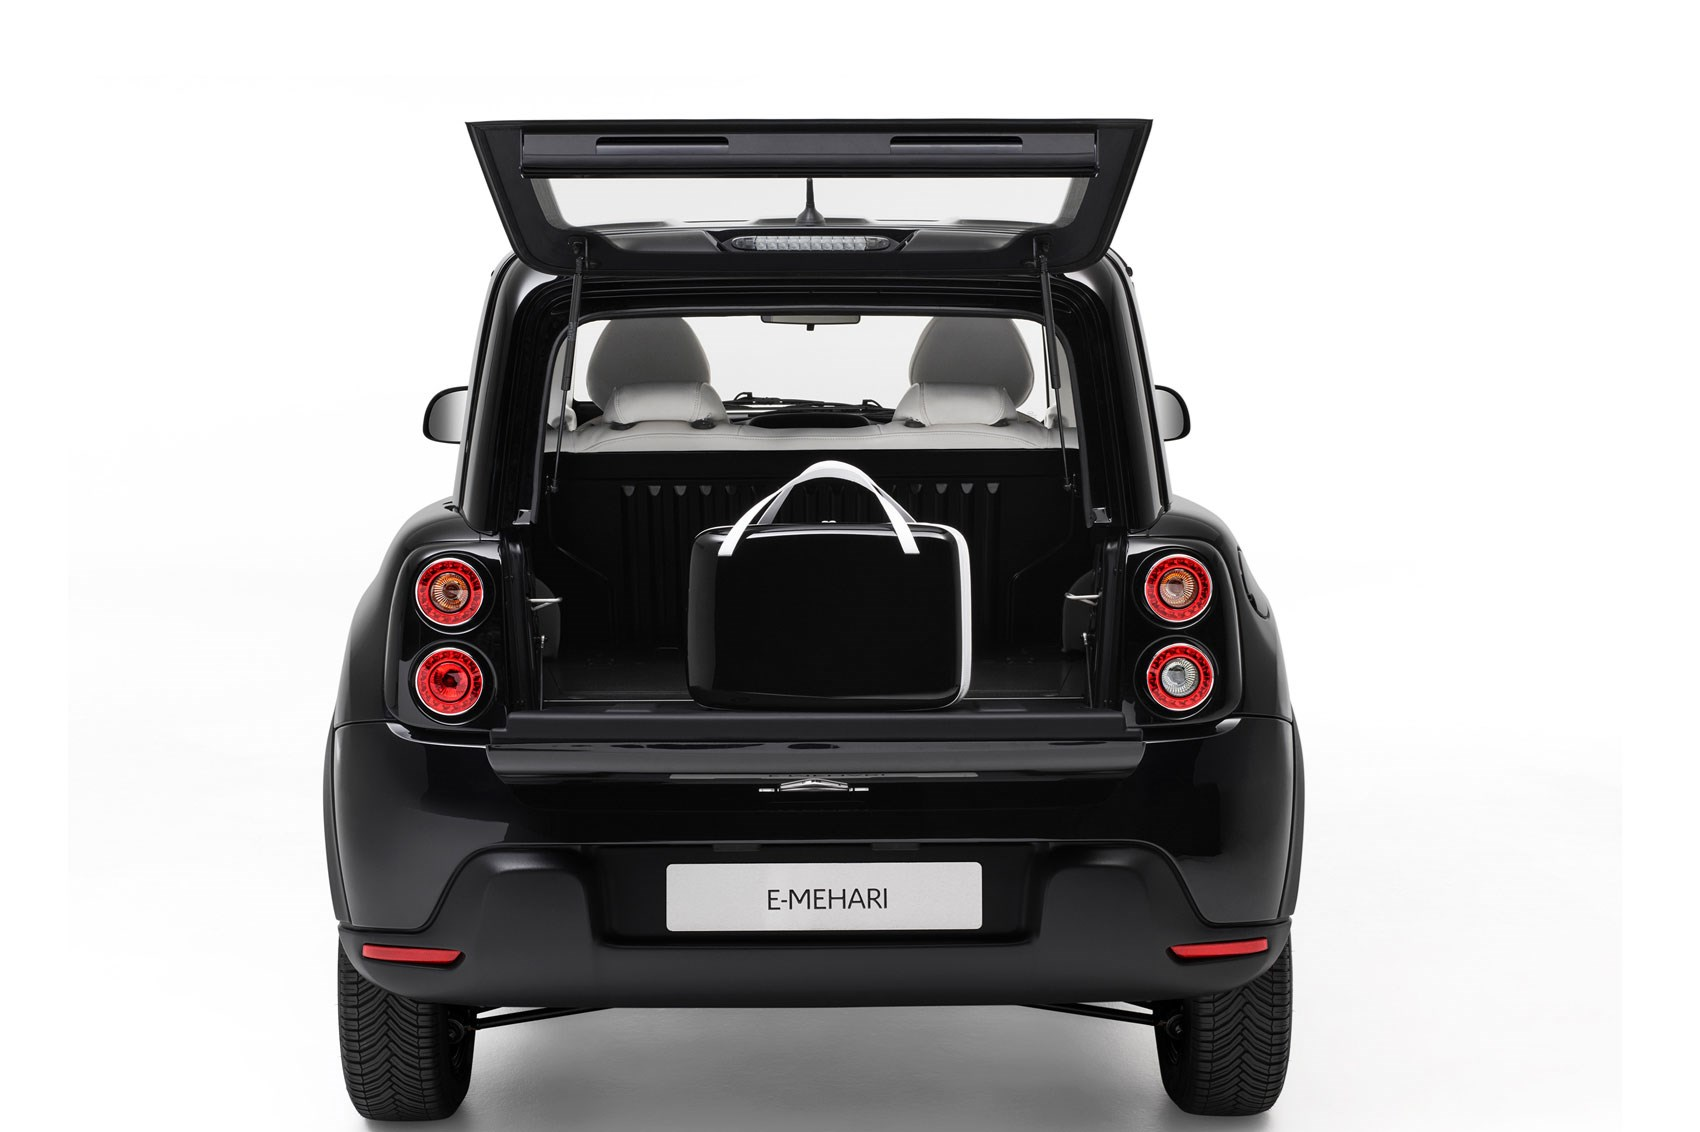 citroen e mehari styled by courreges at 2017 frankfurt motor show car magazine. Black Bedroom Furniture Sets. Home Design Ideas